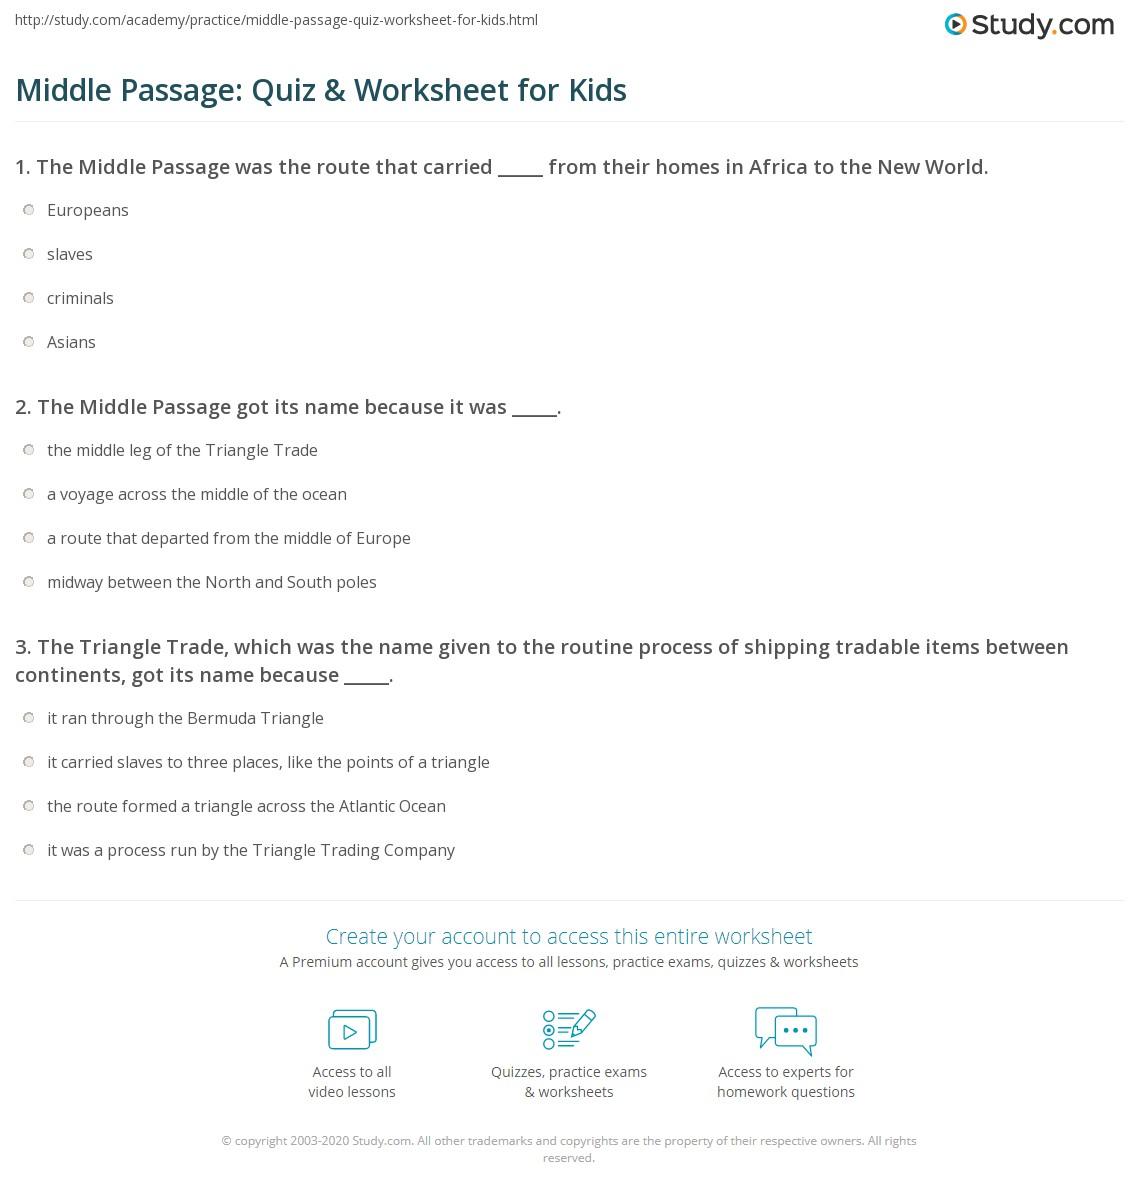 Middle Passage: Quiz & Worksheet for Kids   Study.com